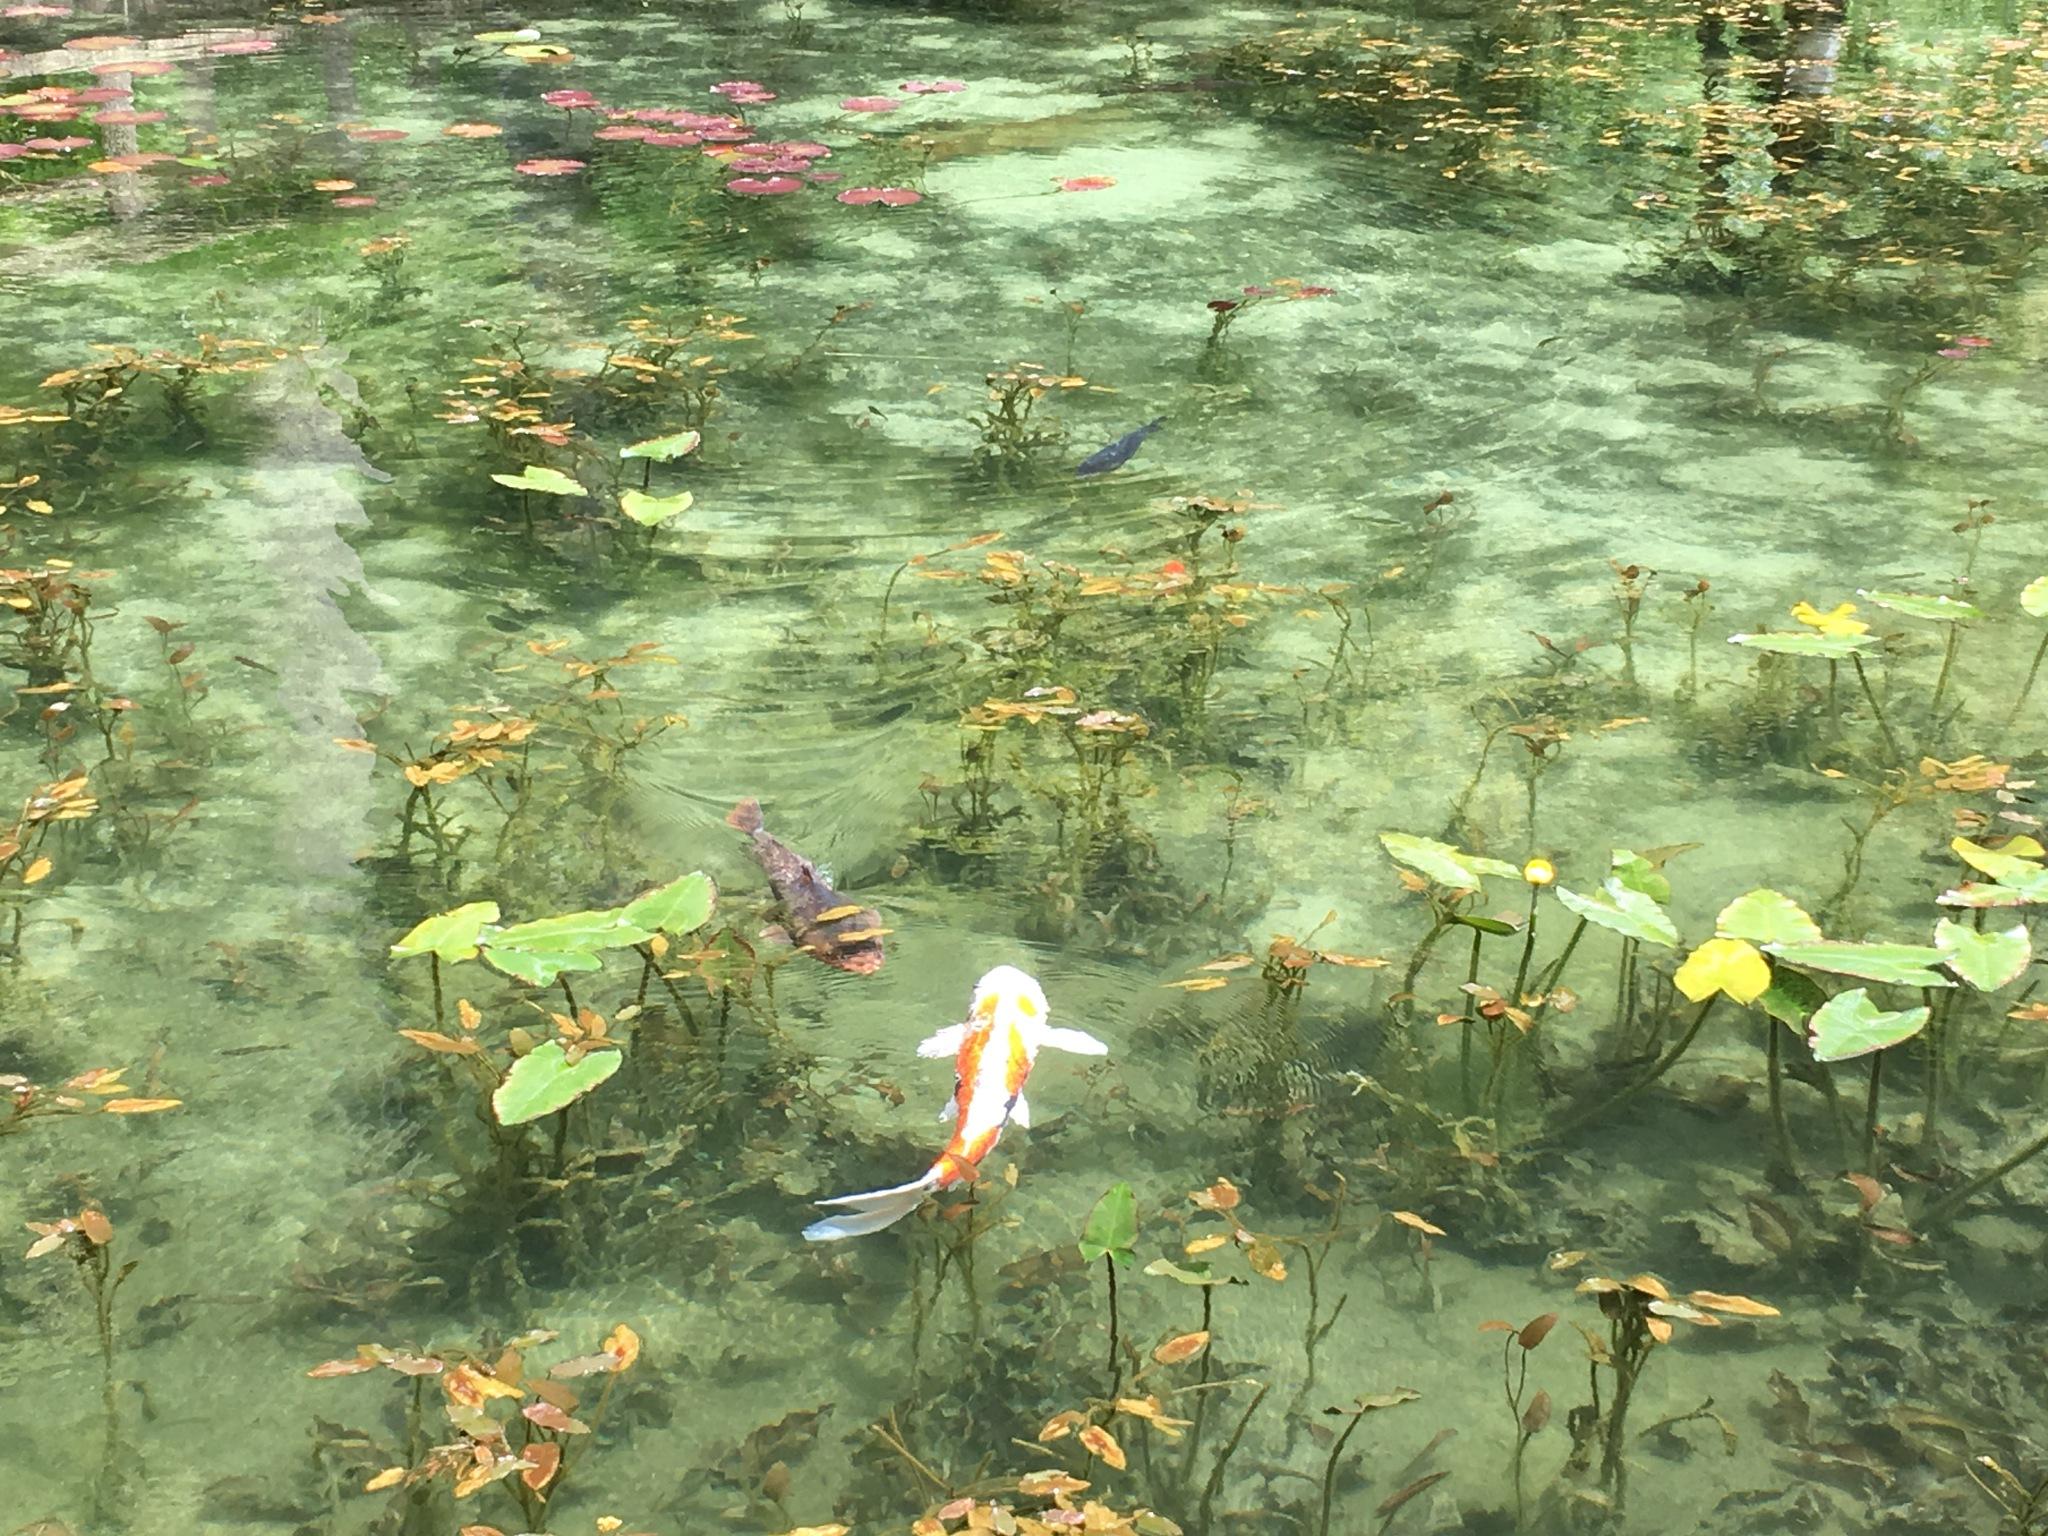 Pond of Monet by Takahirok